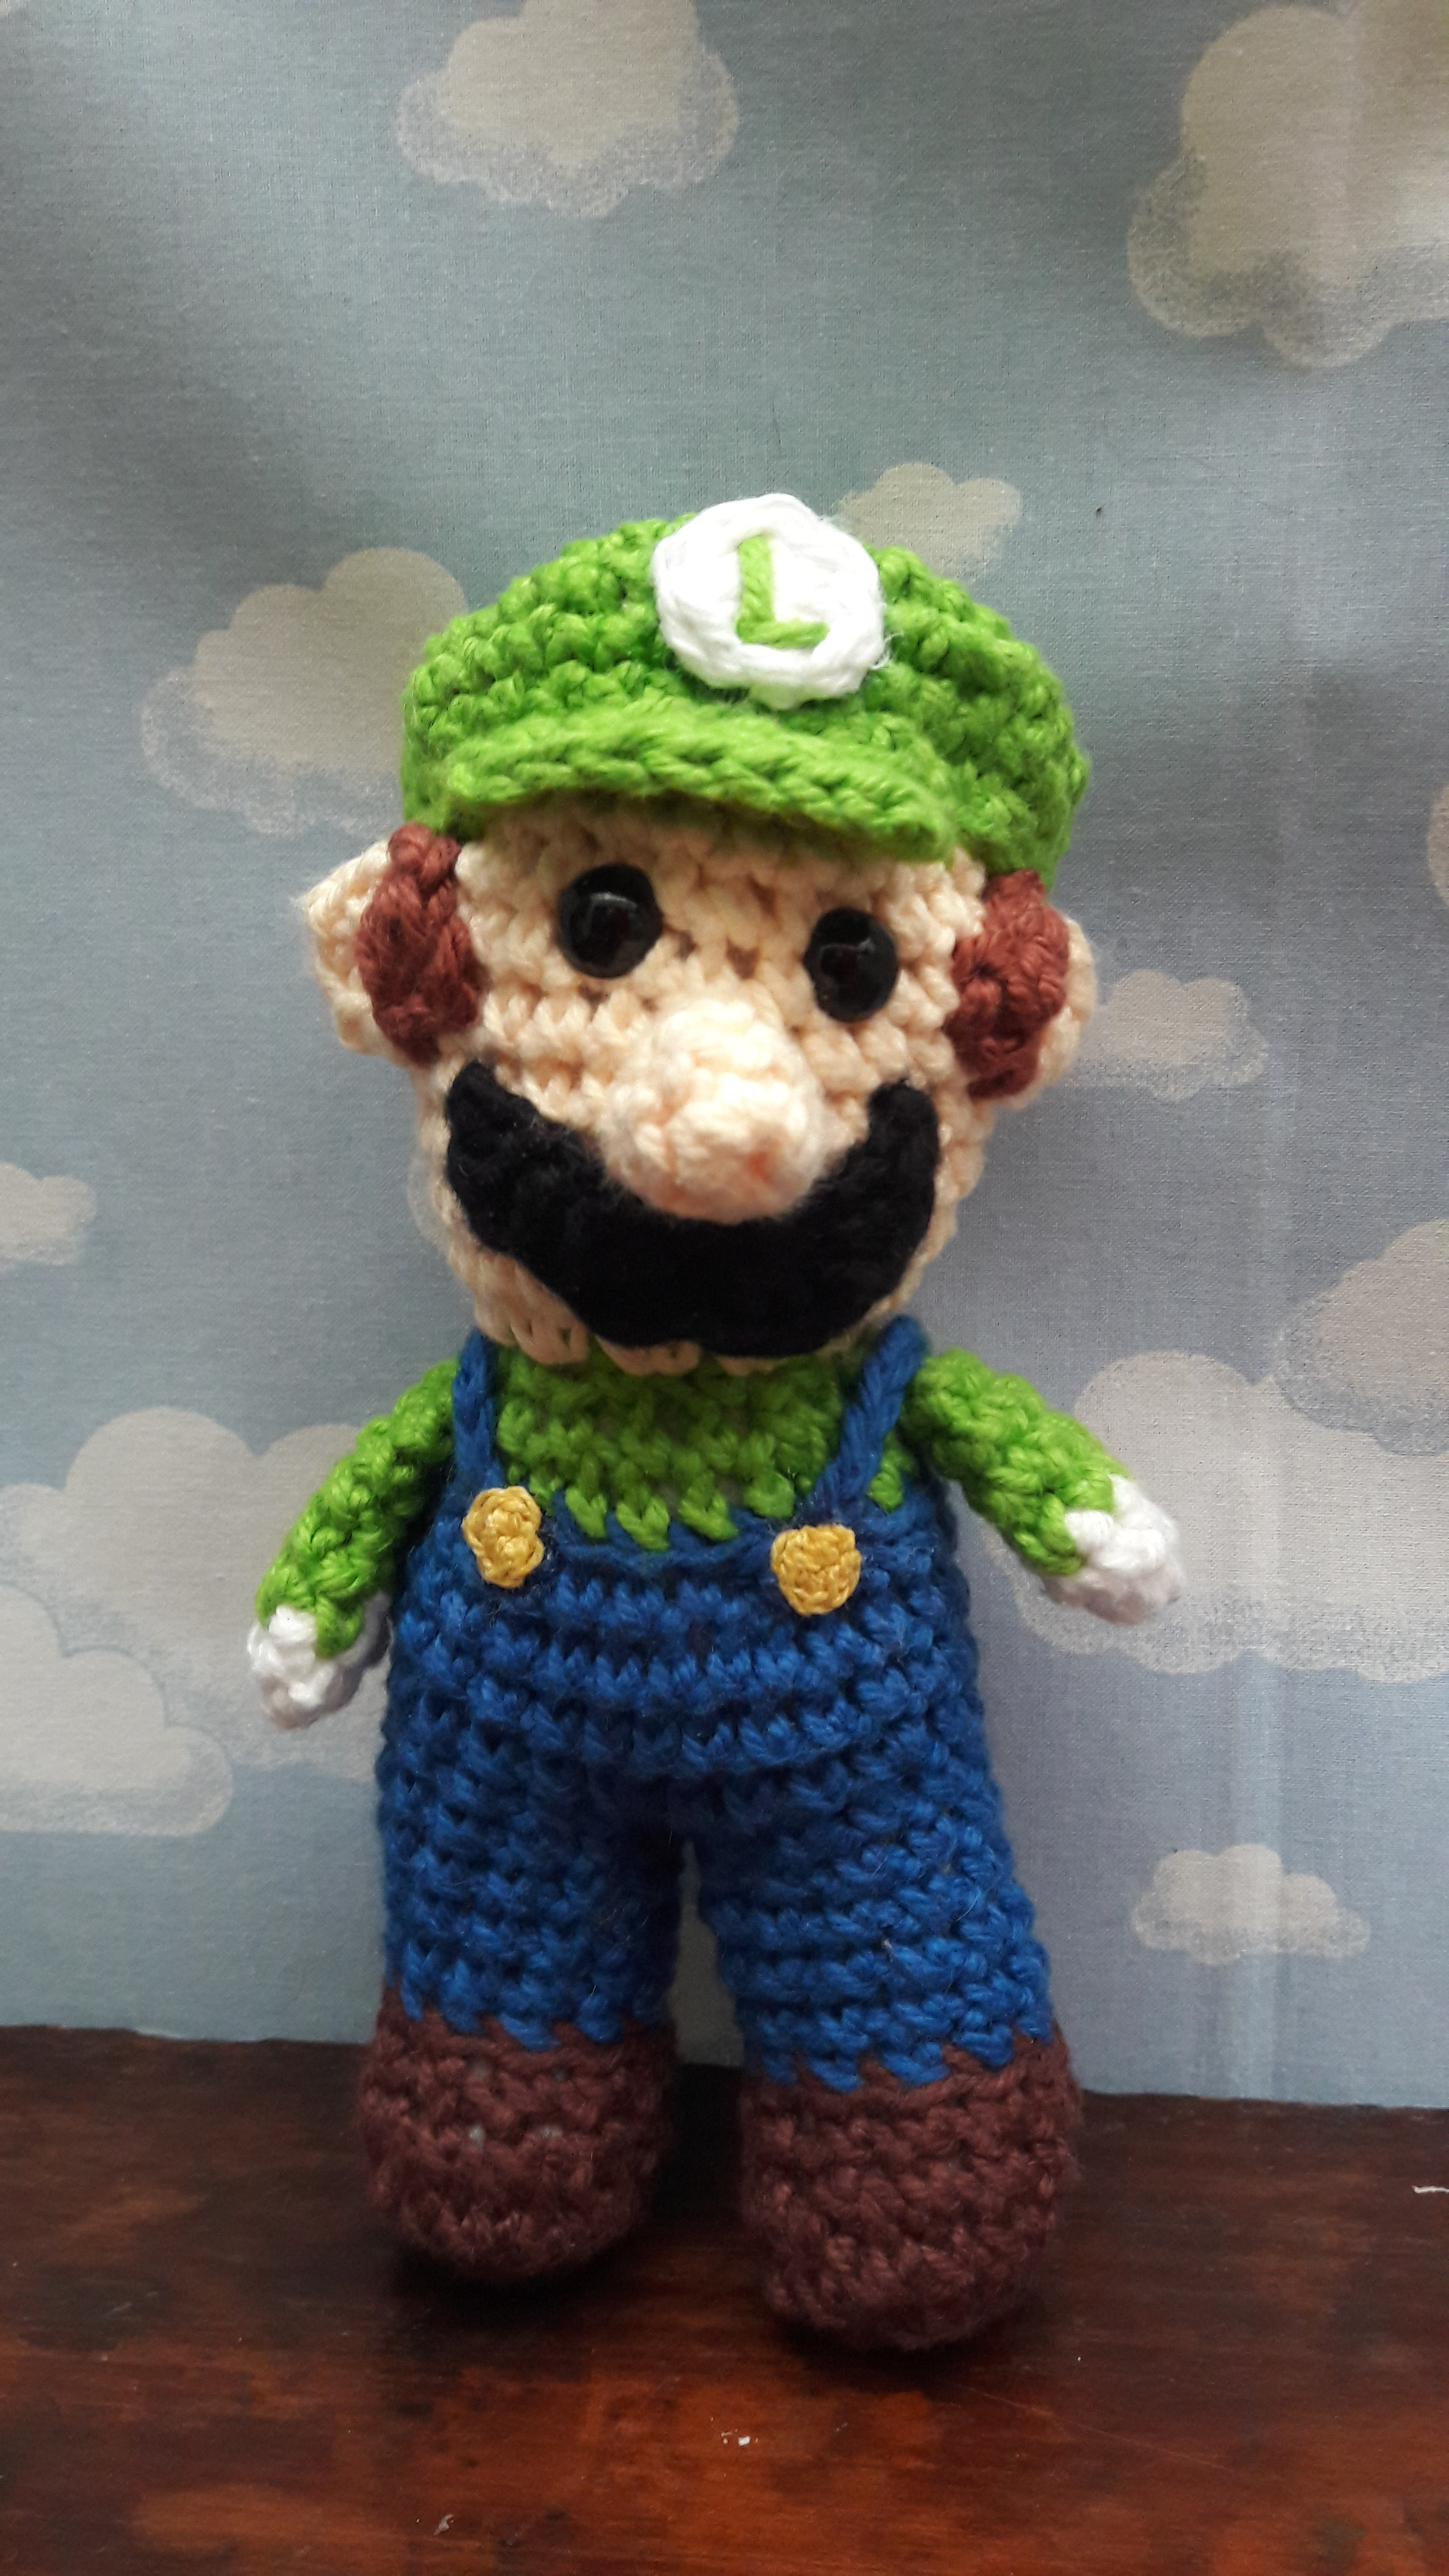 Luigi (With images) | Crochet patterns amigurumi, Crochet, Crochet ... | 4128x2322